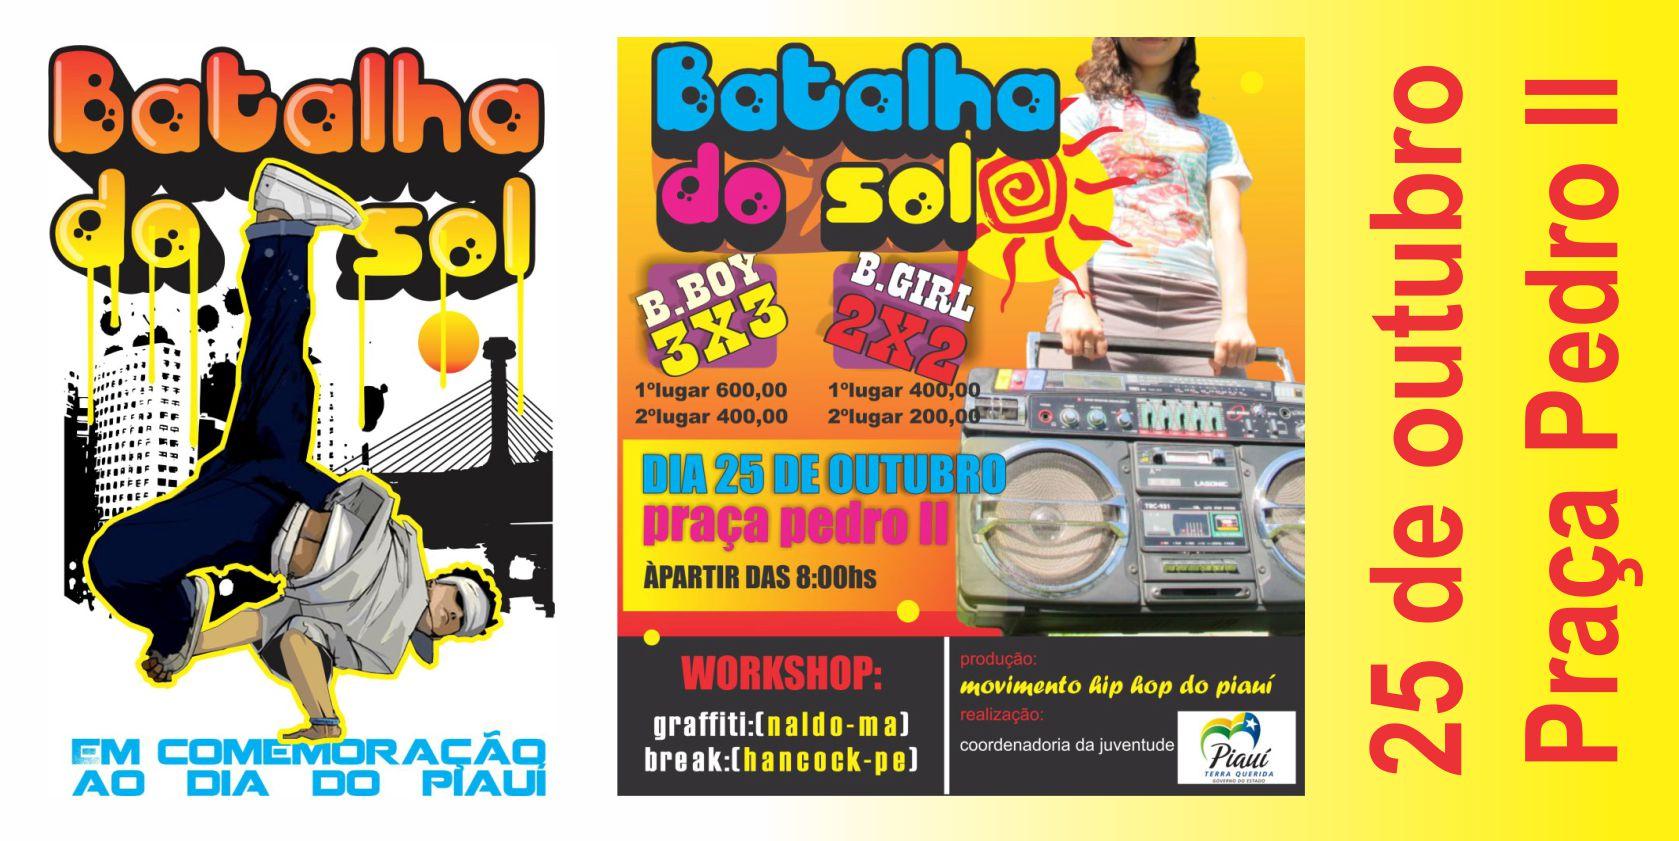 Cojuv realiza Workshop e Batalha de Hip Hop em Teresina